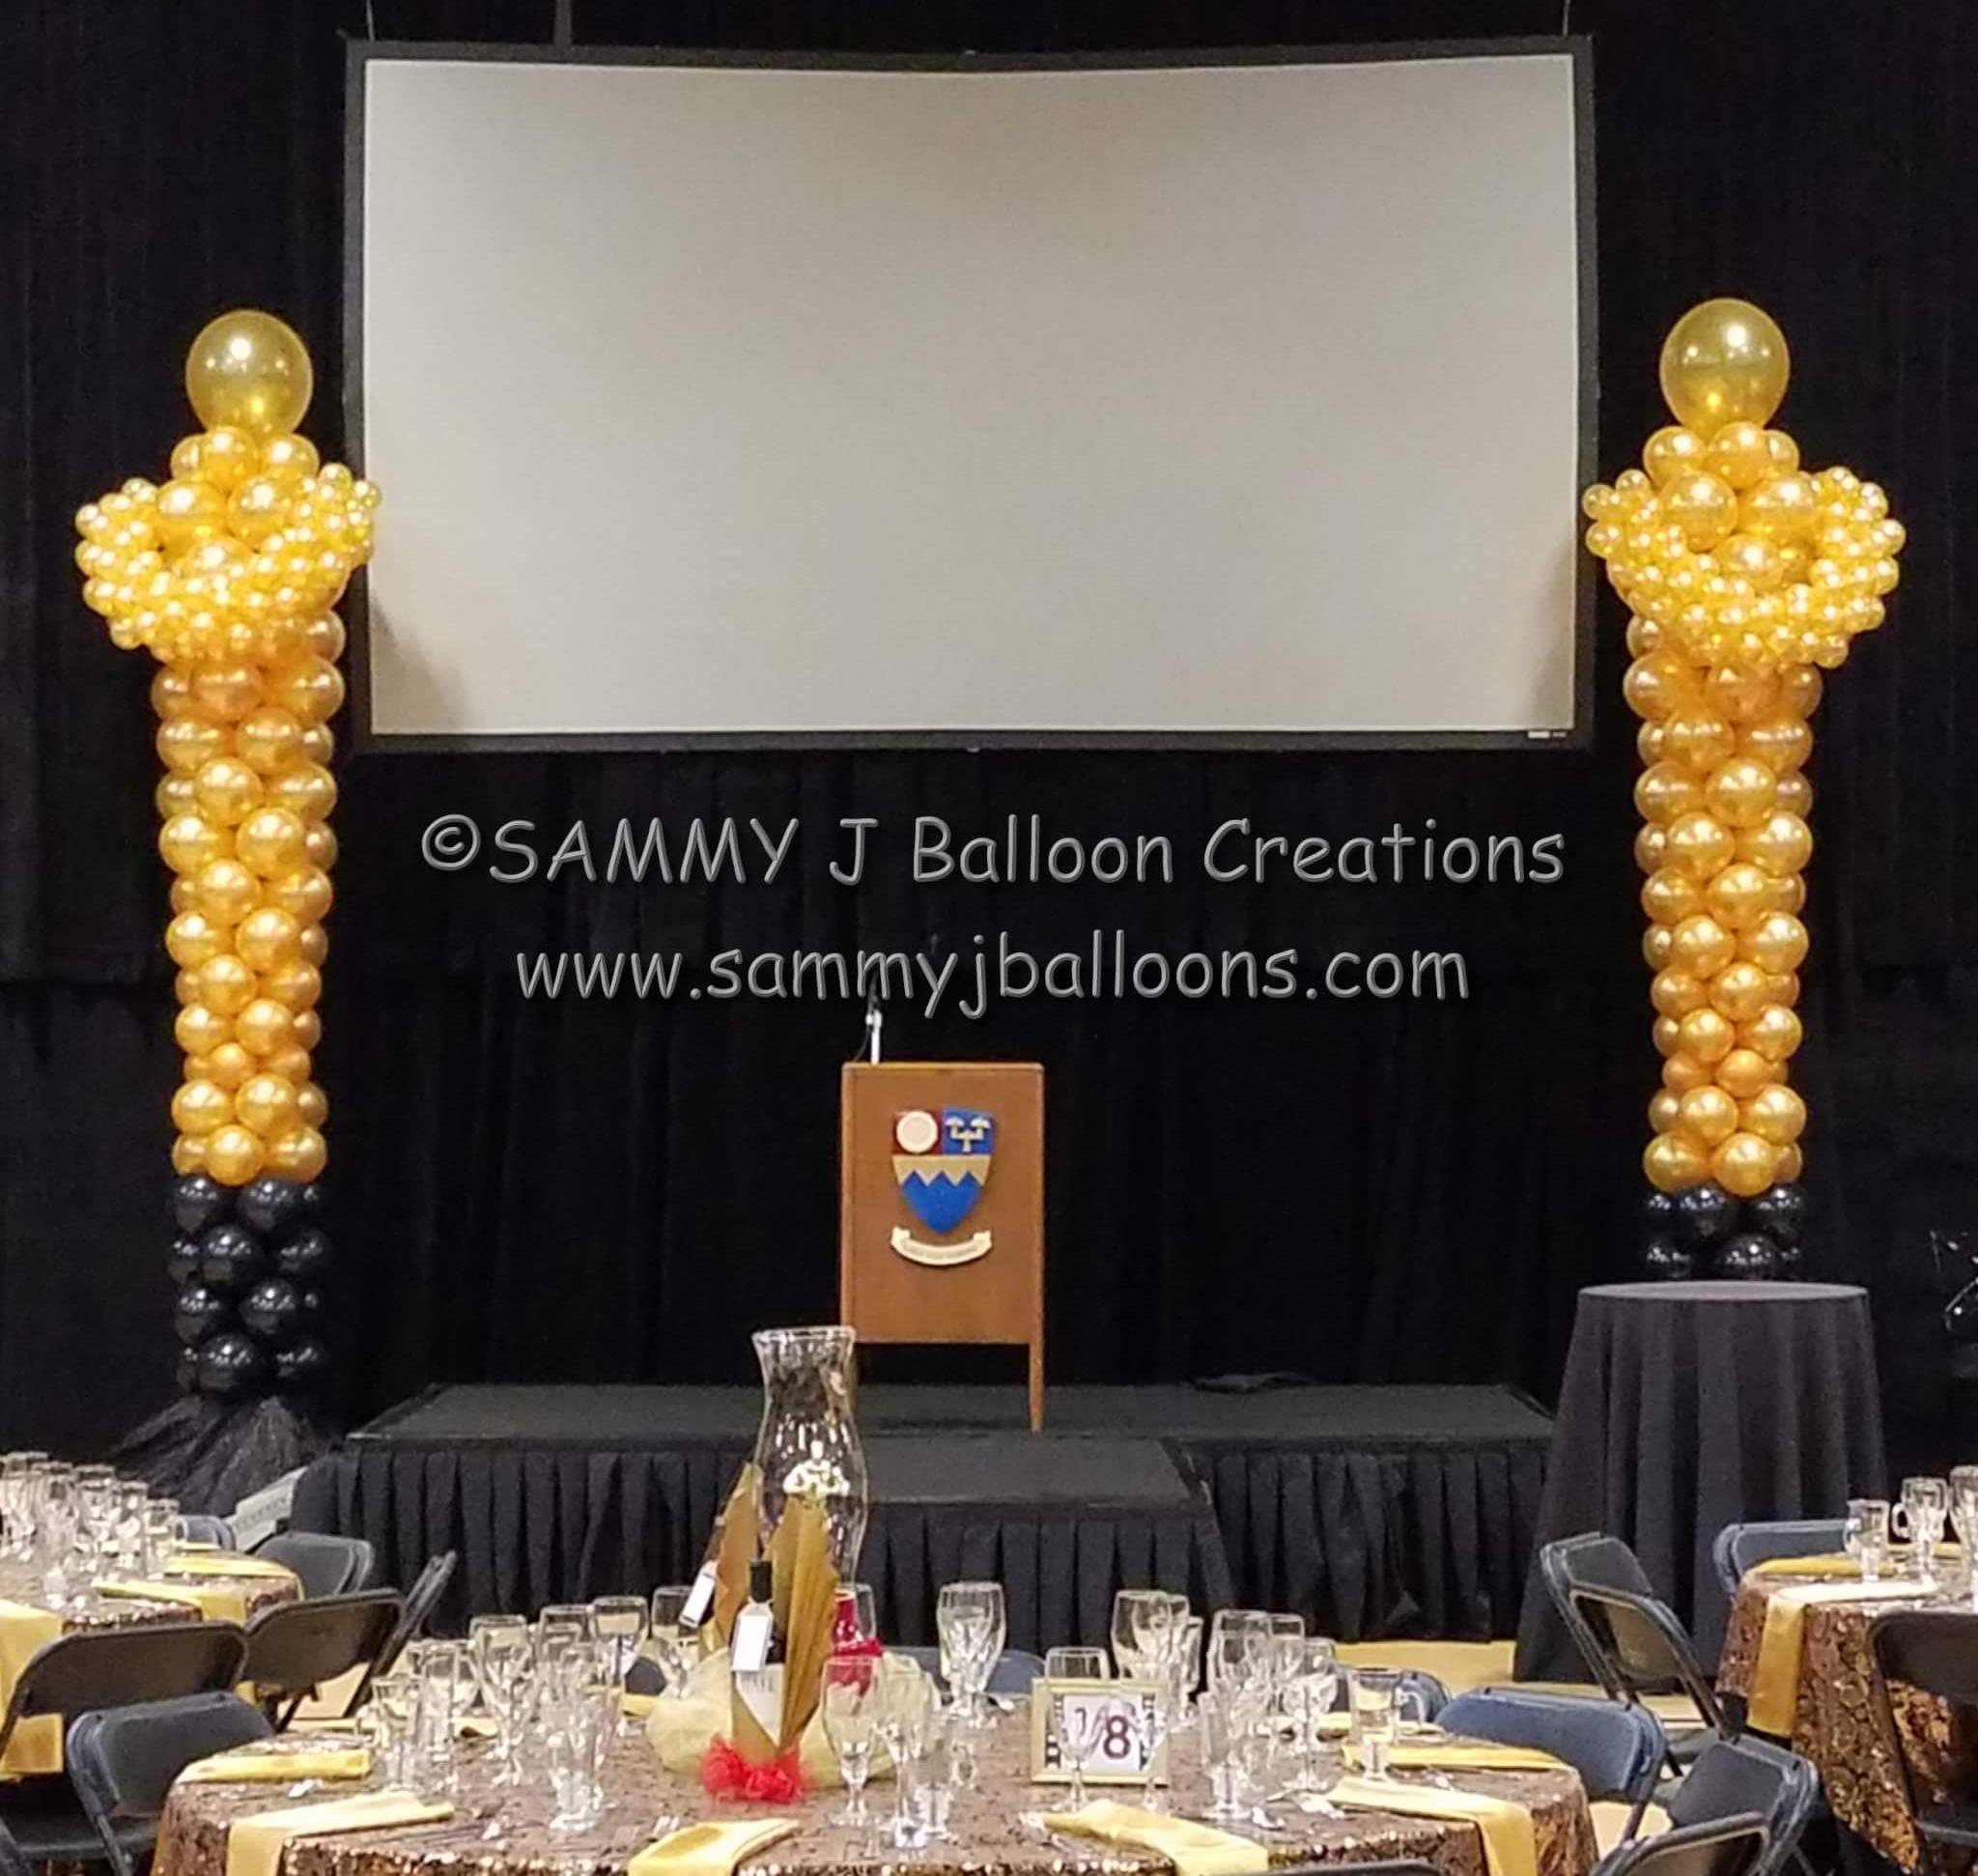 SAMMY J Balloon Creations st louis balloons oscar award statue